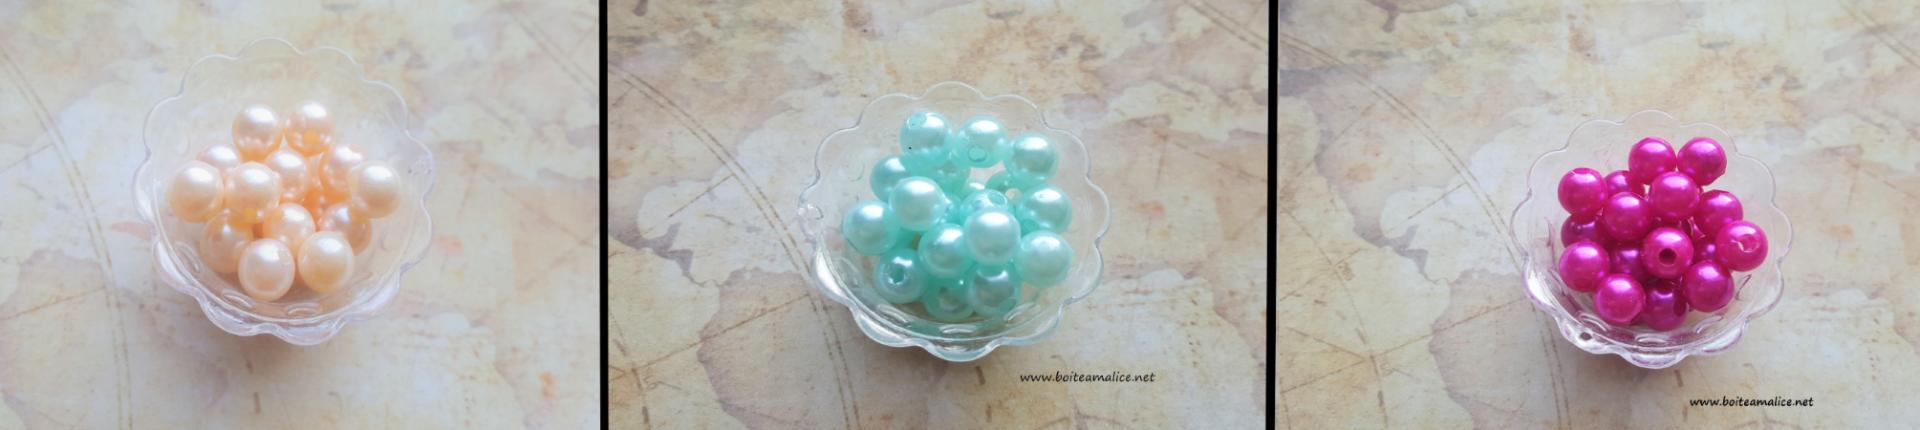 Perles acryliques